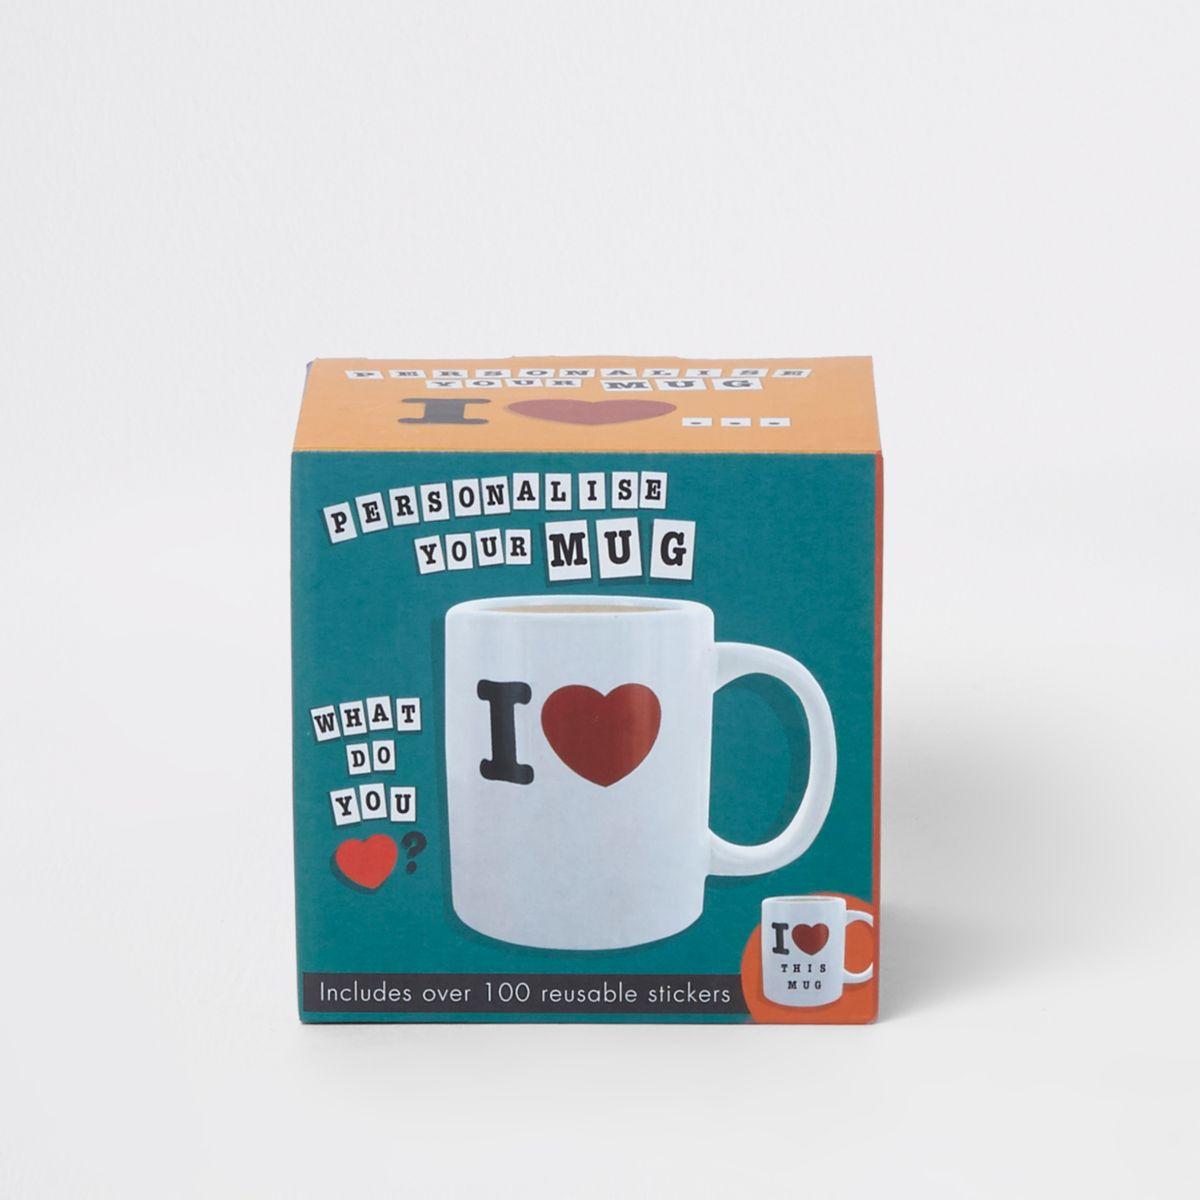 Personalised stickers 'I love' mug